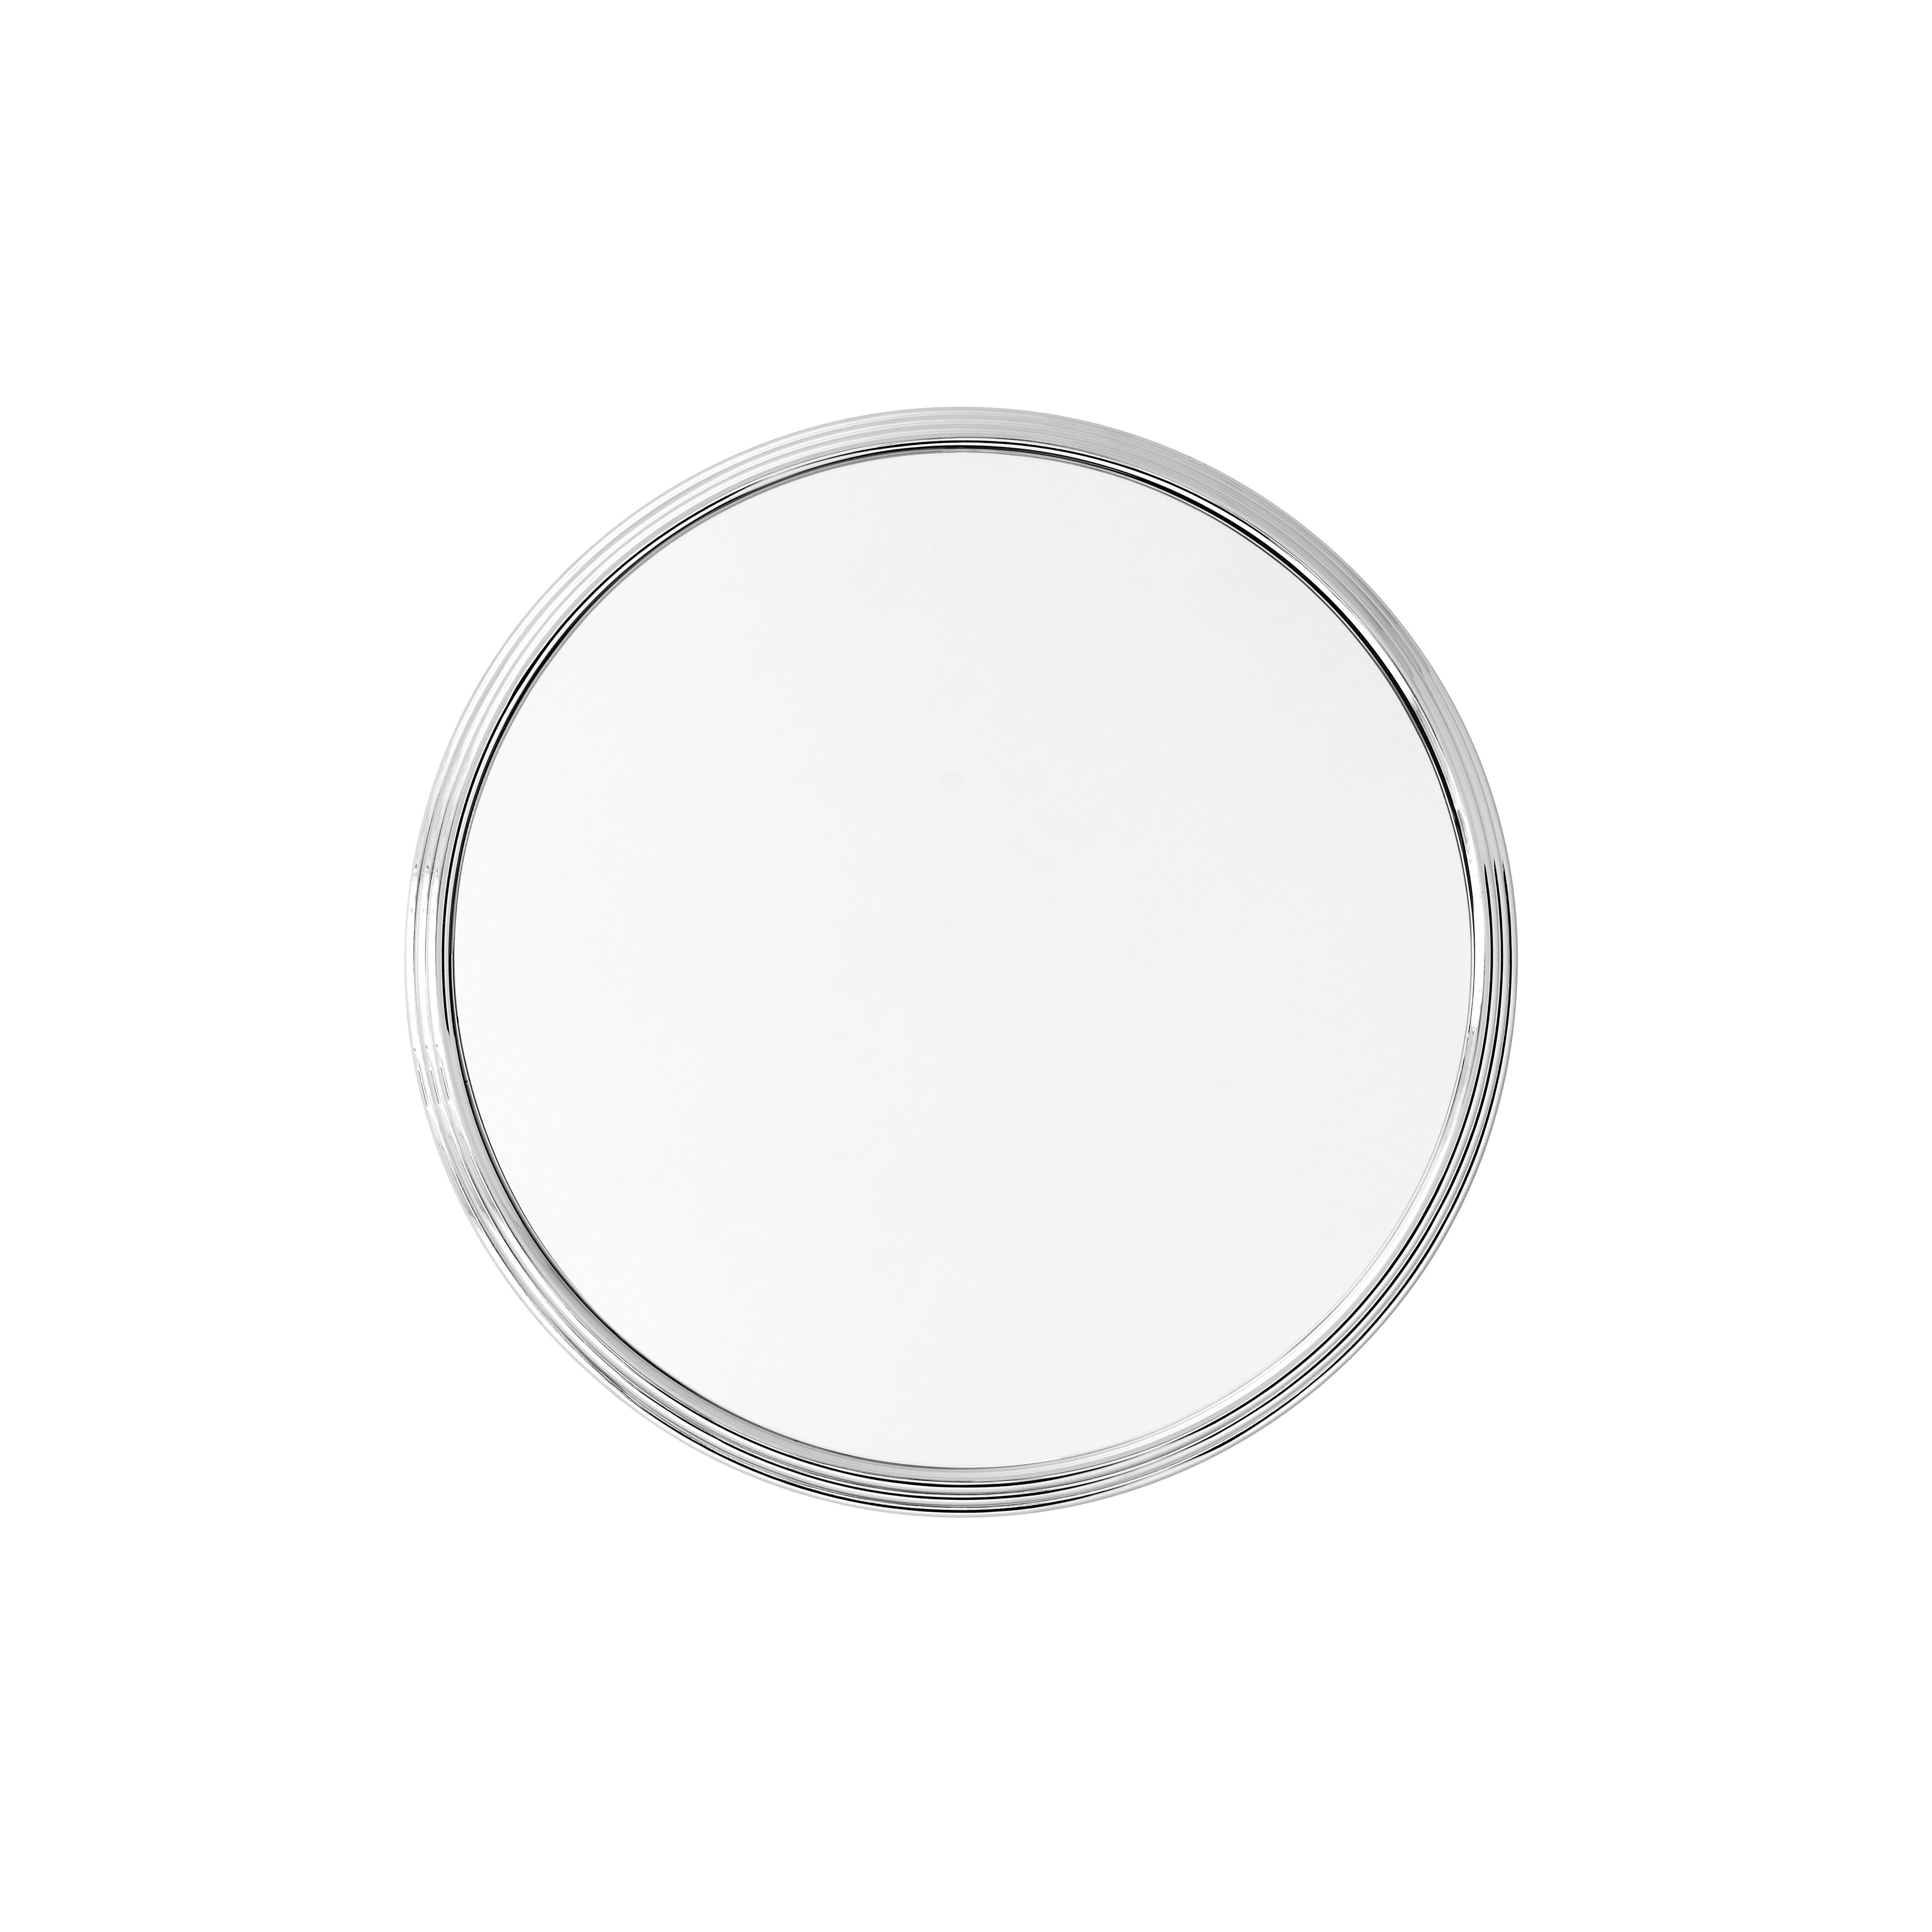 Decoration - Mirrors - Sillon SH4 Wall mirror - / Ø 46 cm by &tradition - Ø 46 cm / Chromed - Chromed steel